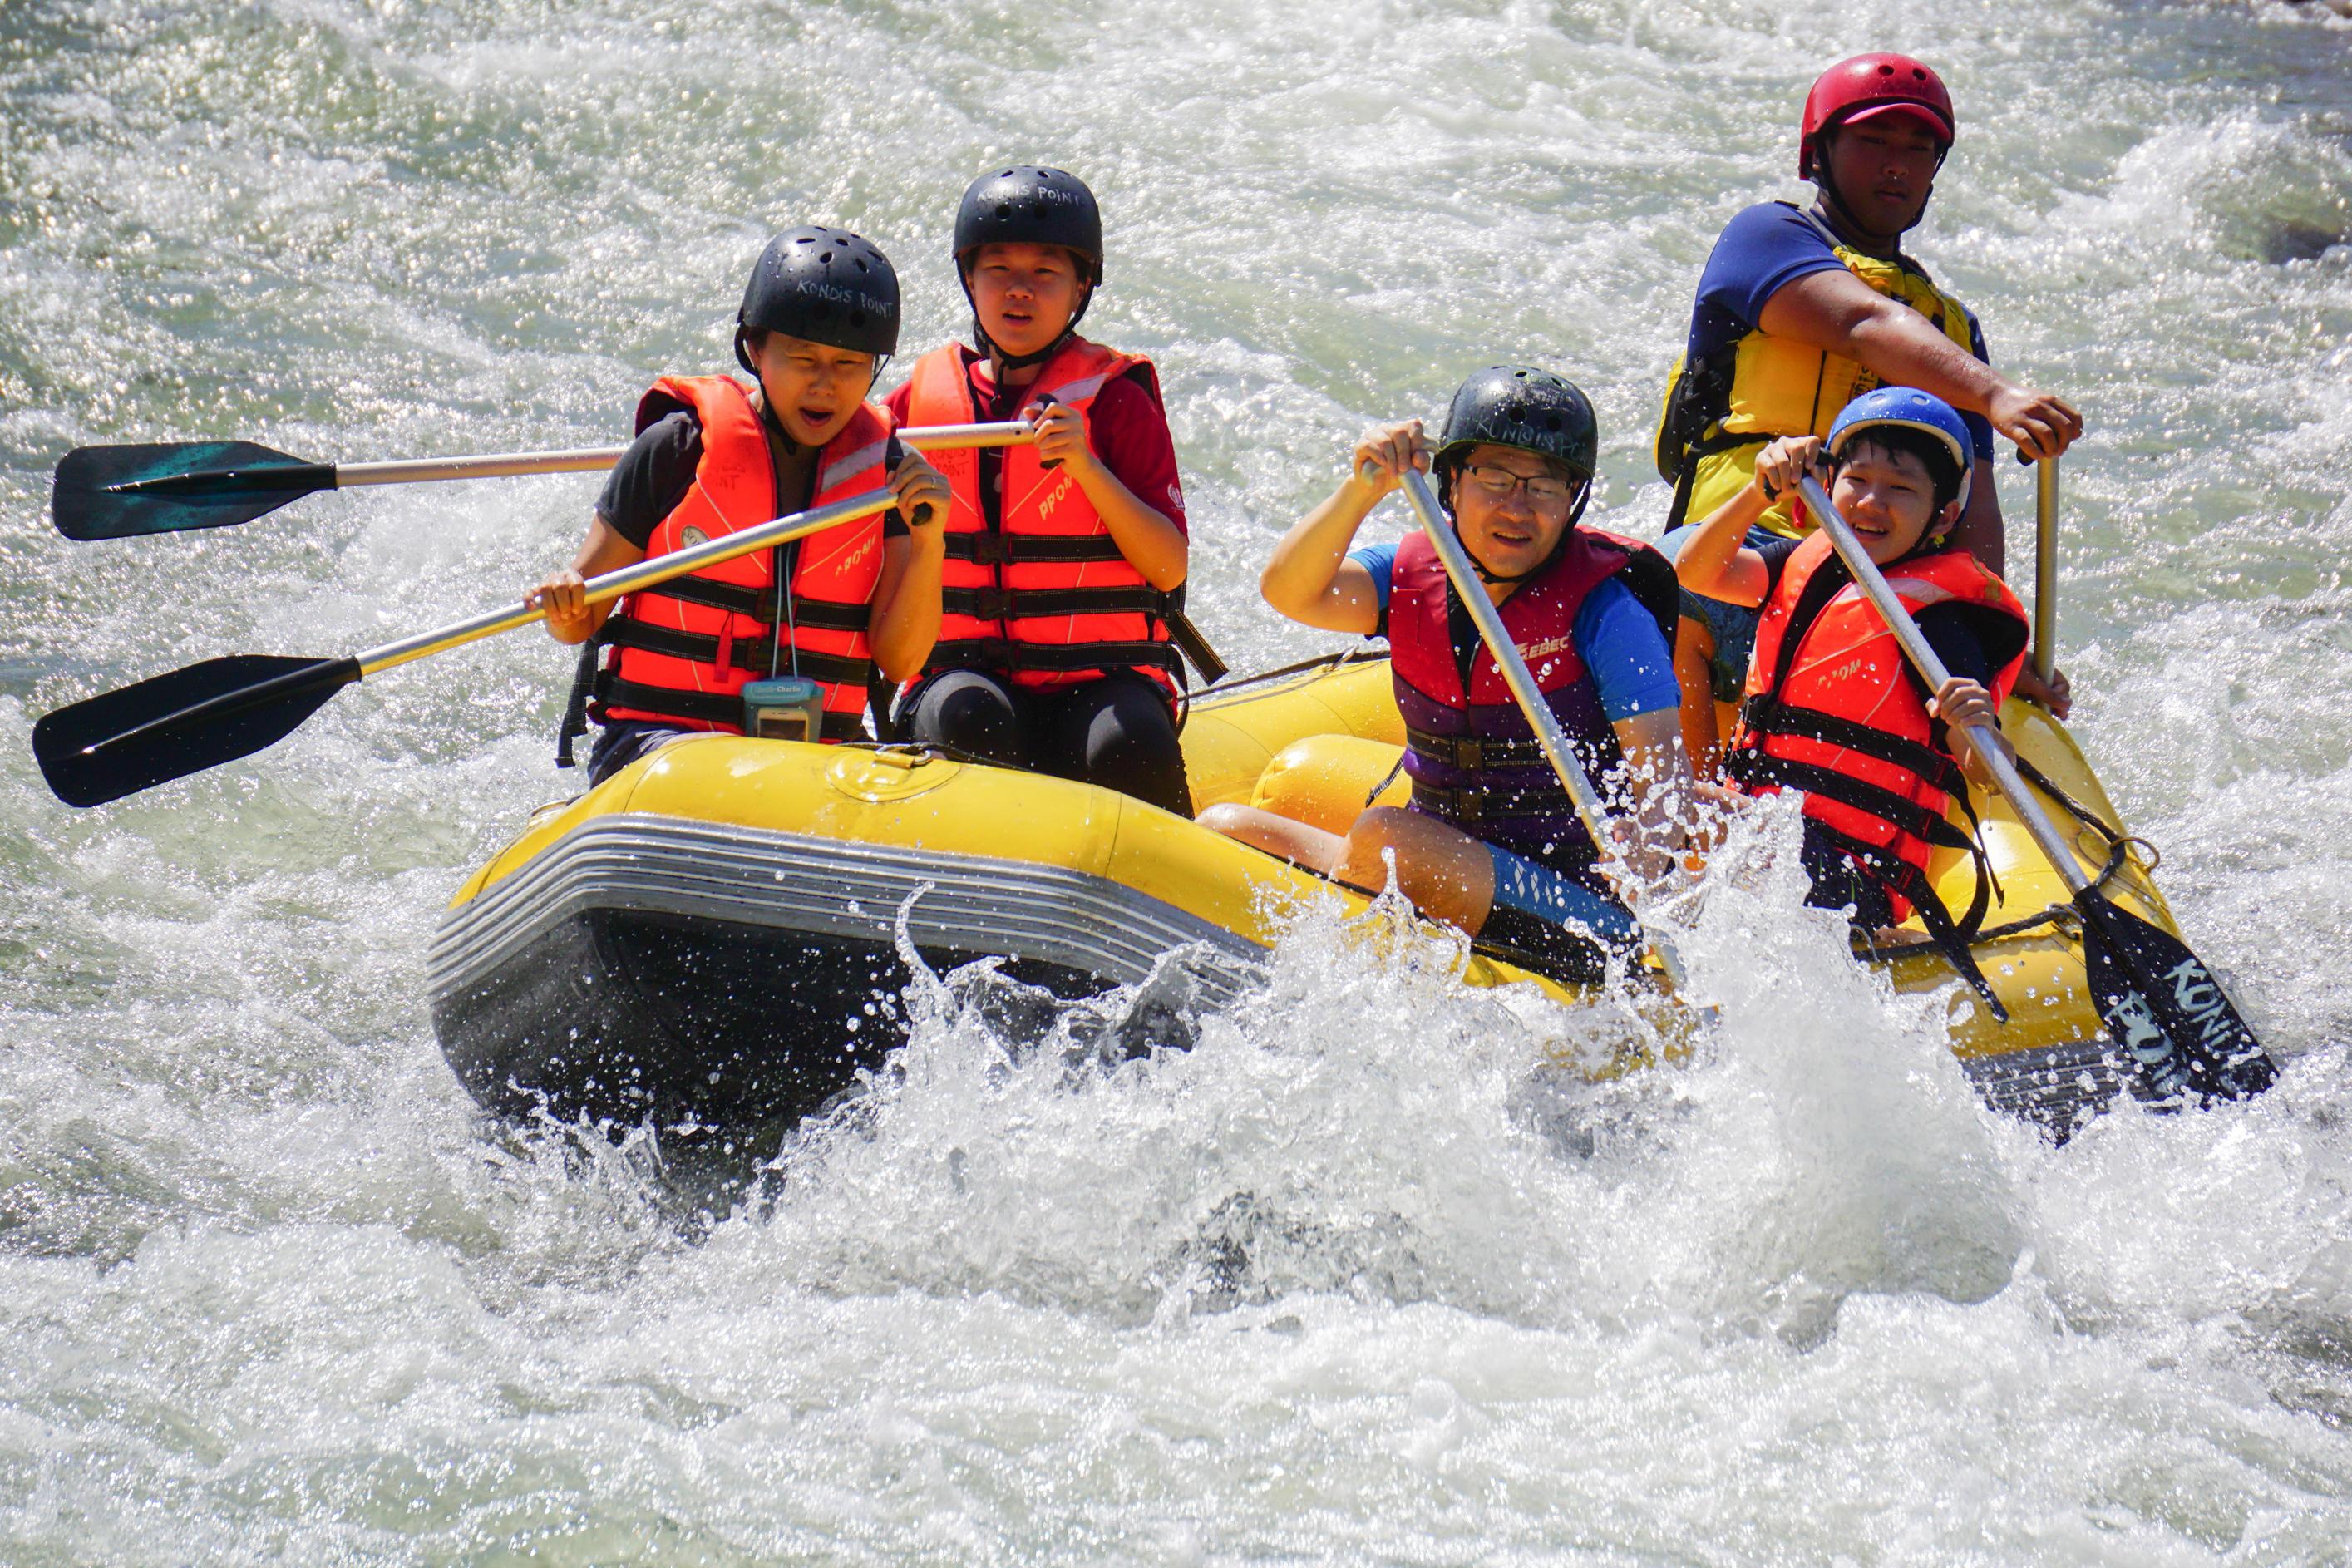 Kiulu Sabah Malaysia - Nov 4, 2018 : Group of adventurer doing white water rafting activity at Kiulu river Sabah Malaysian Borneo on Nov 4, 2018.The r